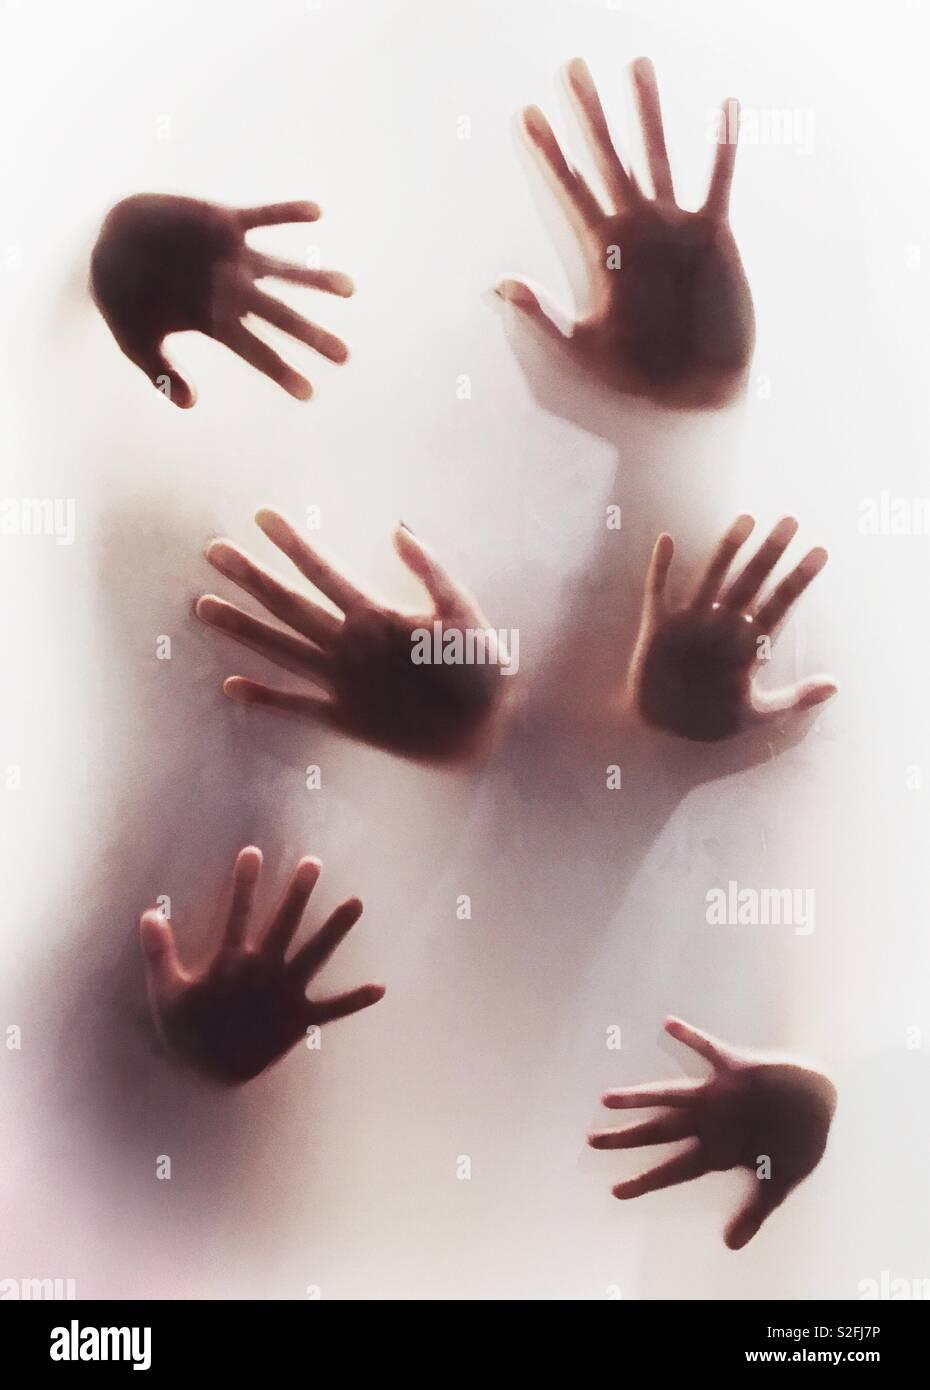 Six handbreadths - Stock Image